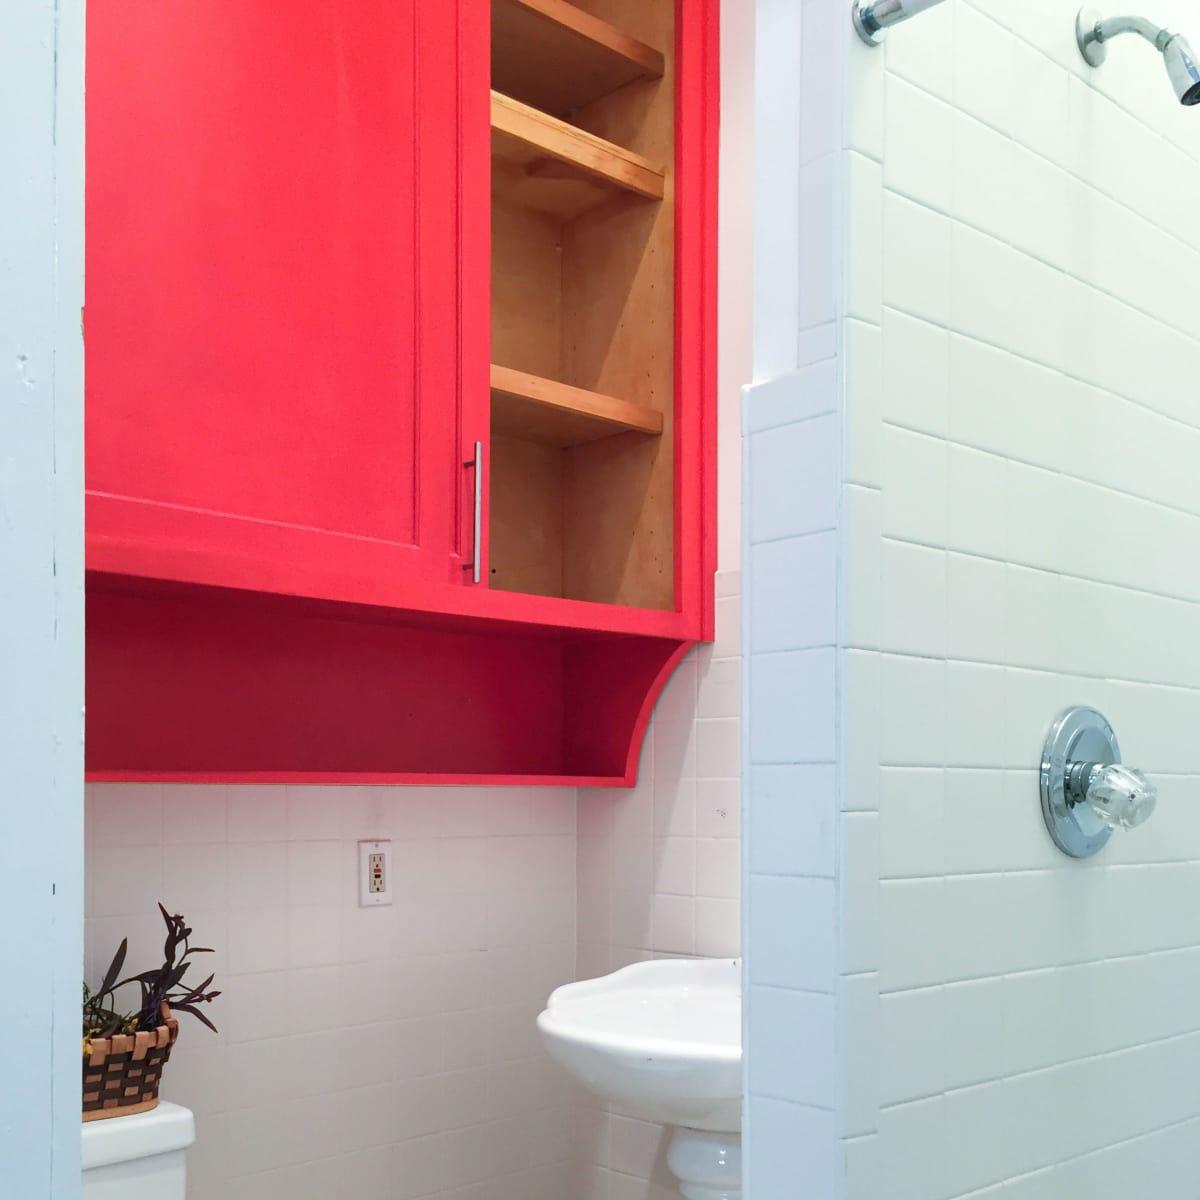 HK Austin hostel bathroom